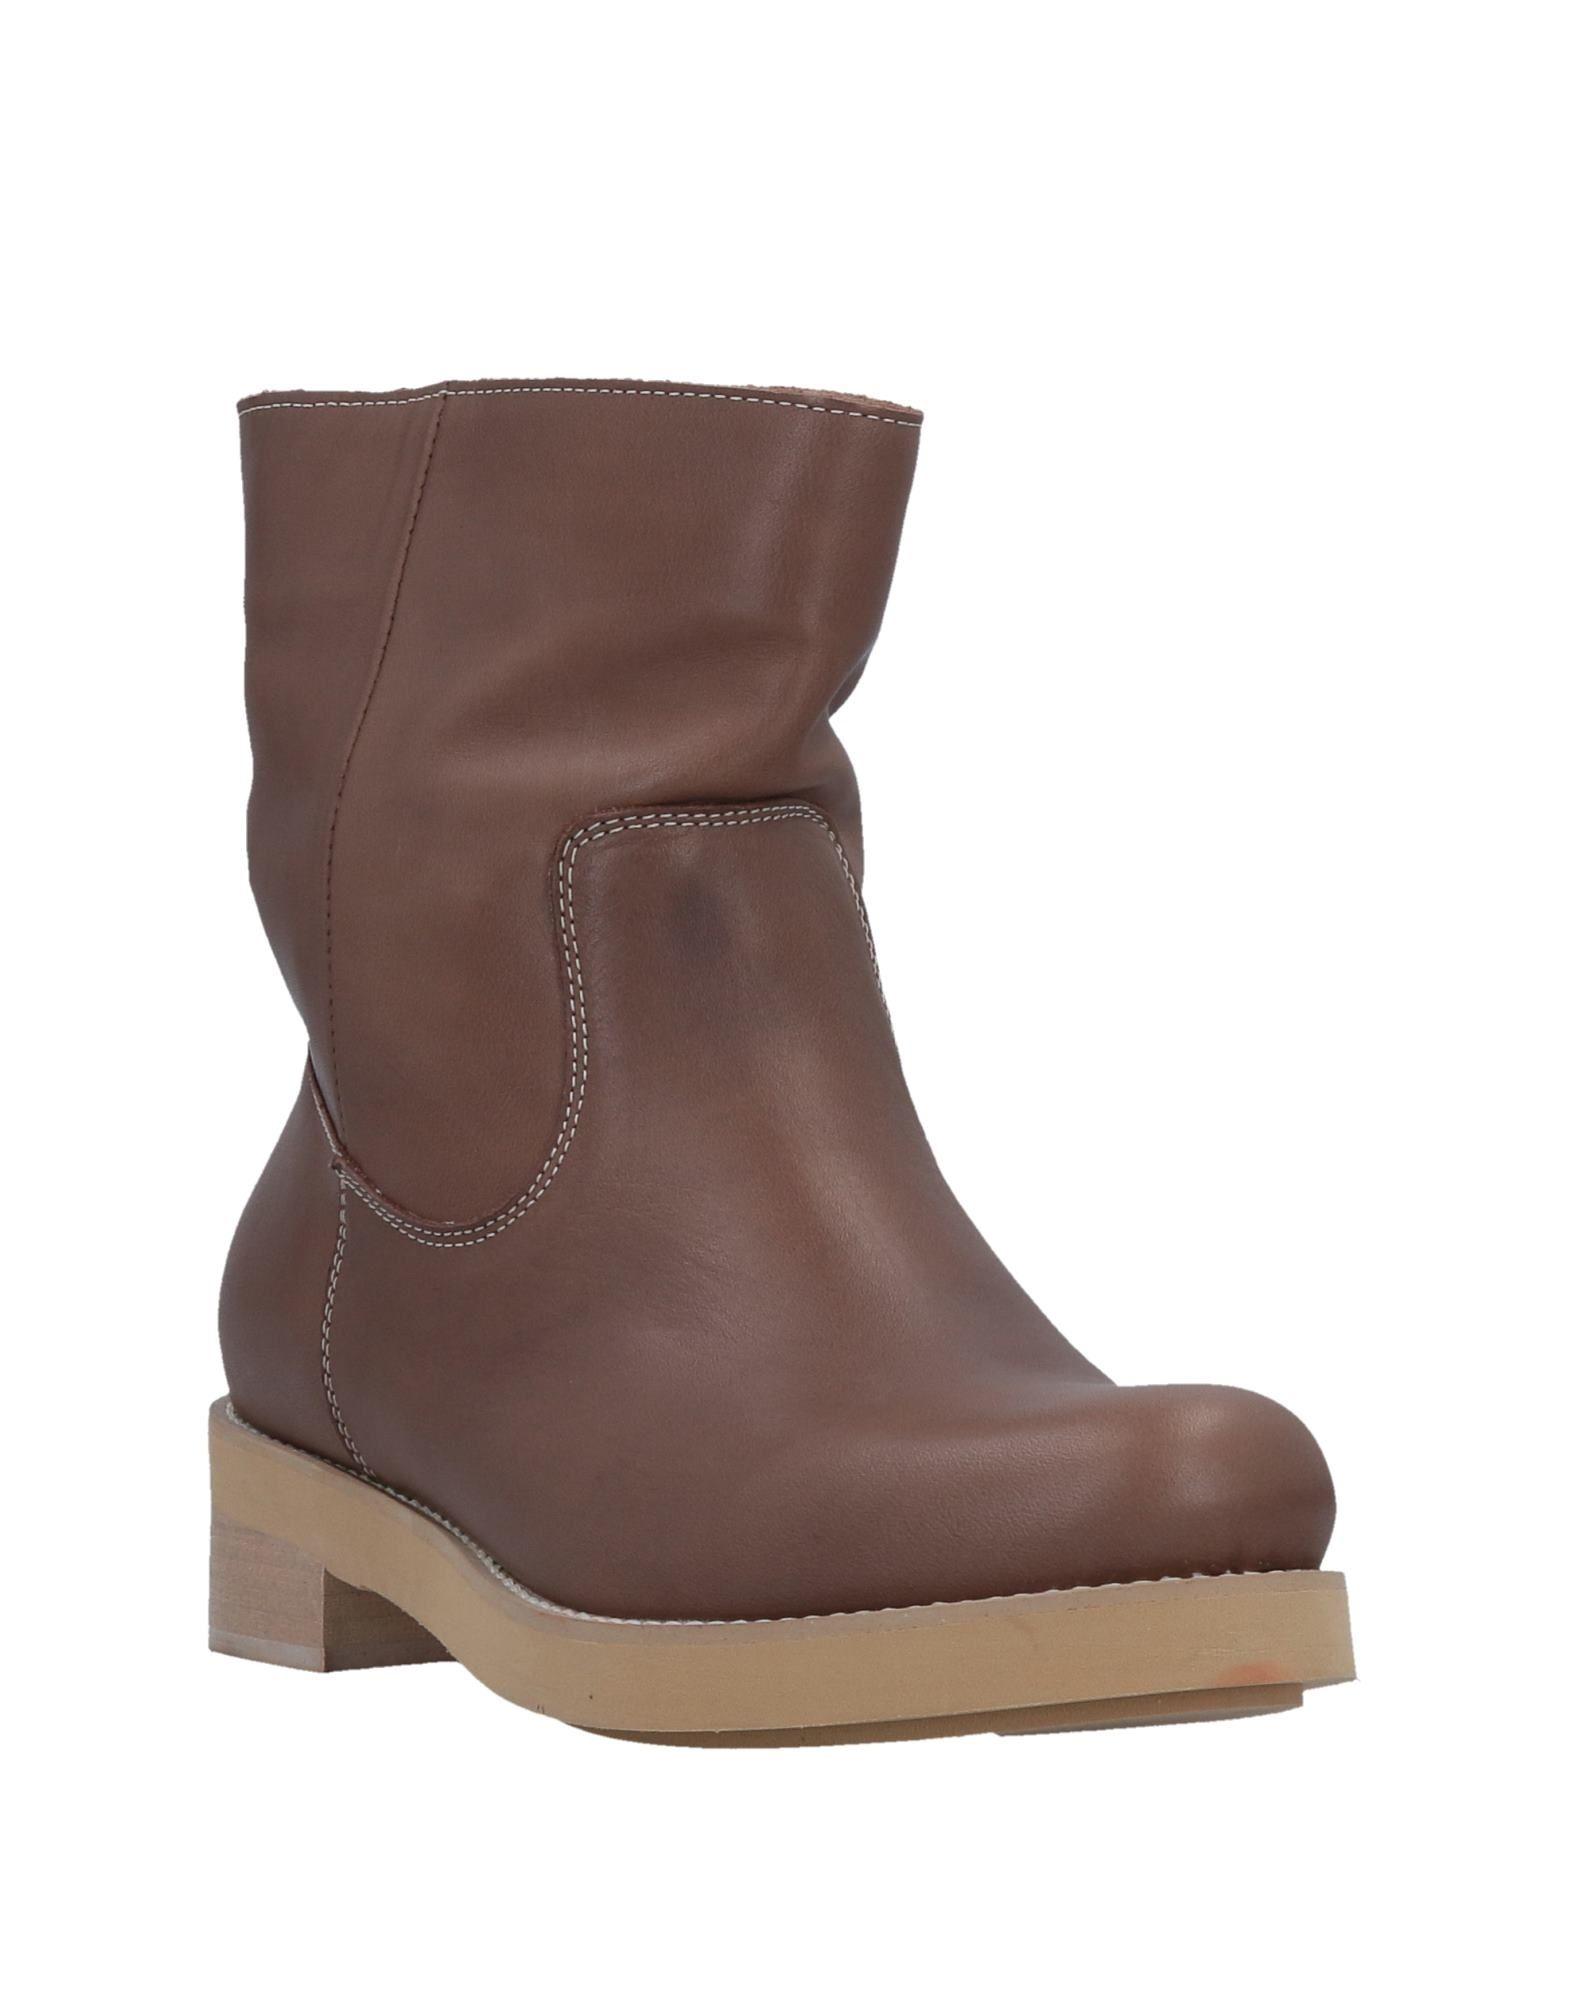 Gut um billige Schuhe Damen zu tragenCristian G Stiefelette Damen Schuhe  11509738NU eed483